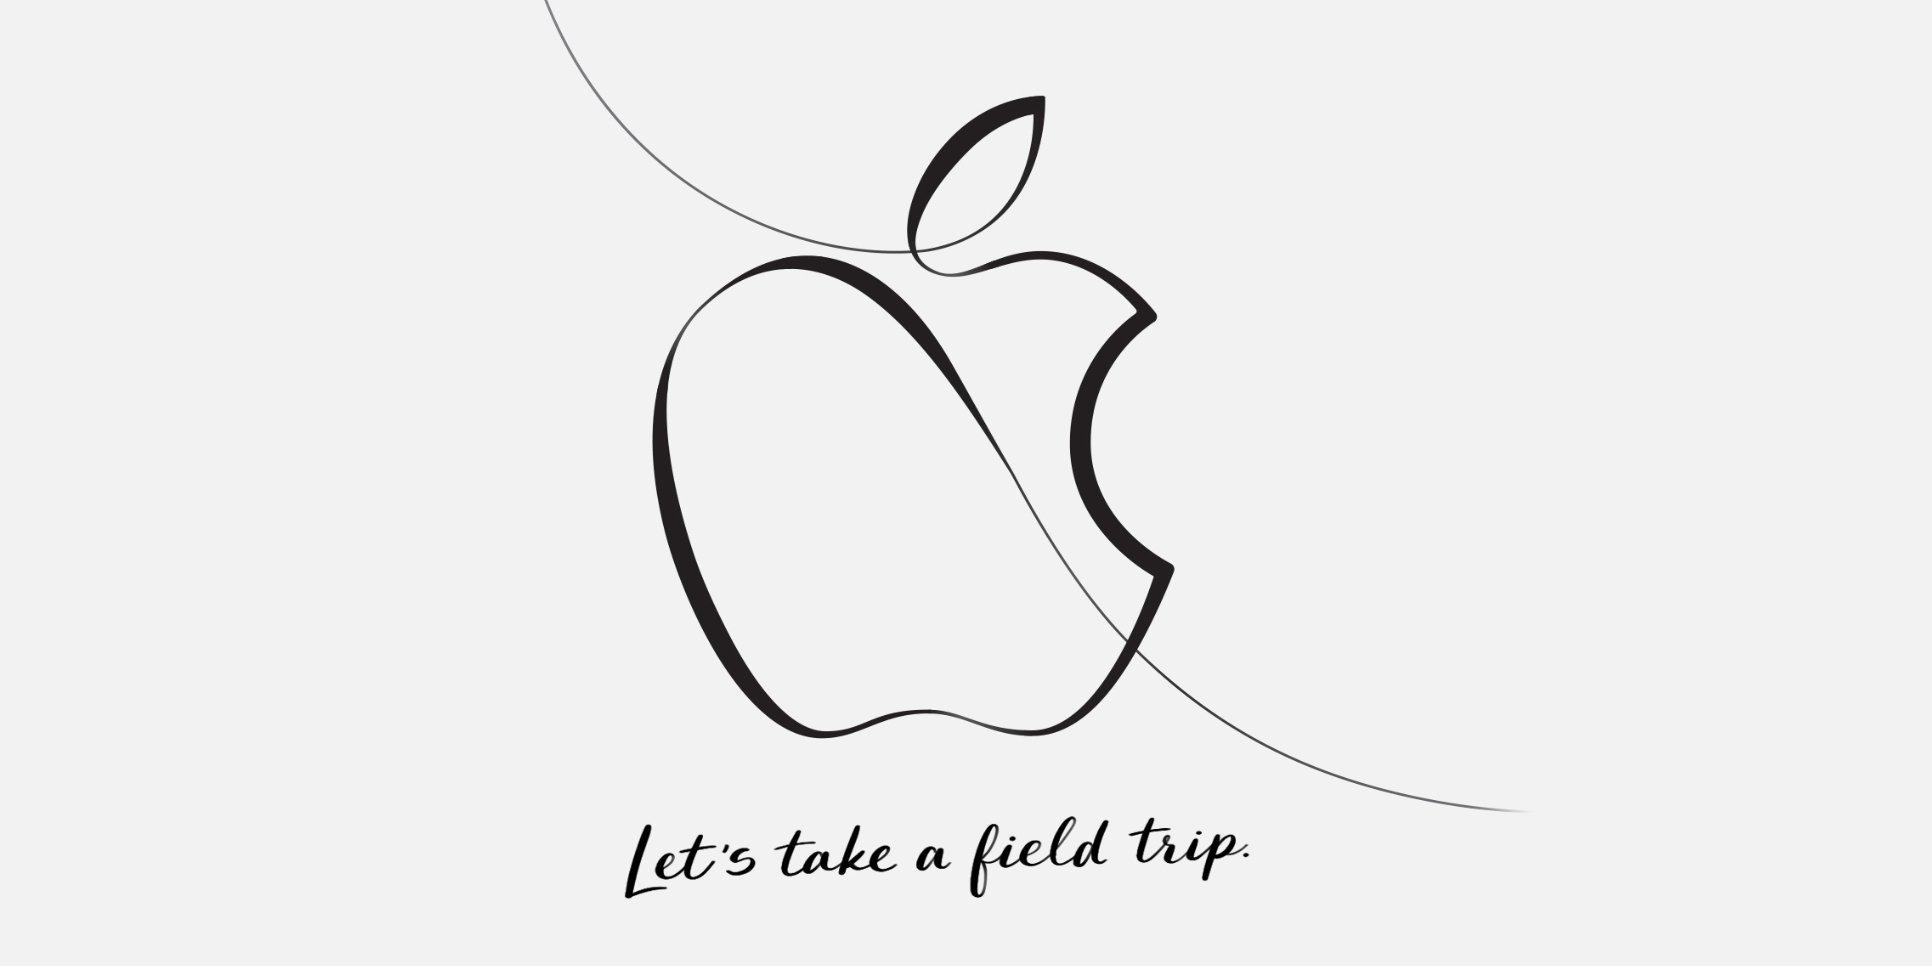 apple keynote March 27 - Apple: the 3 important keynote figures